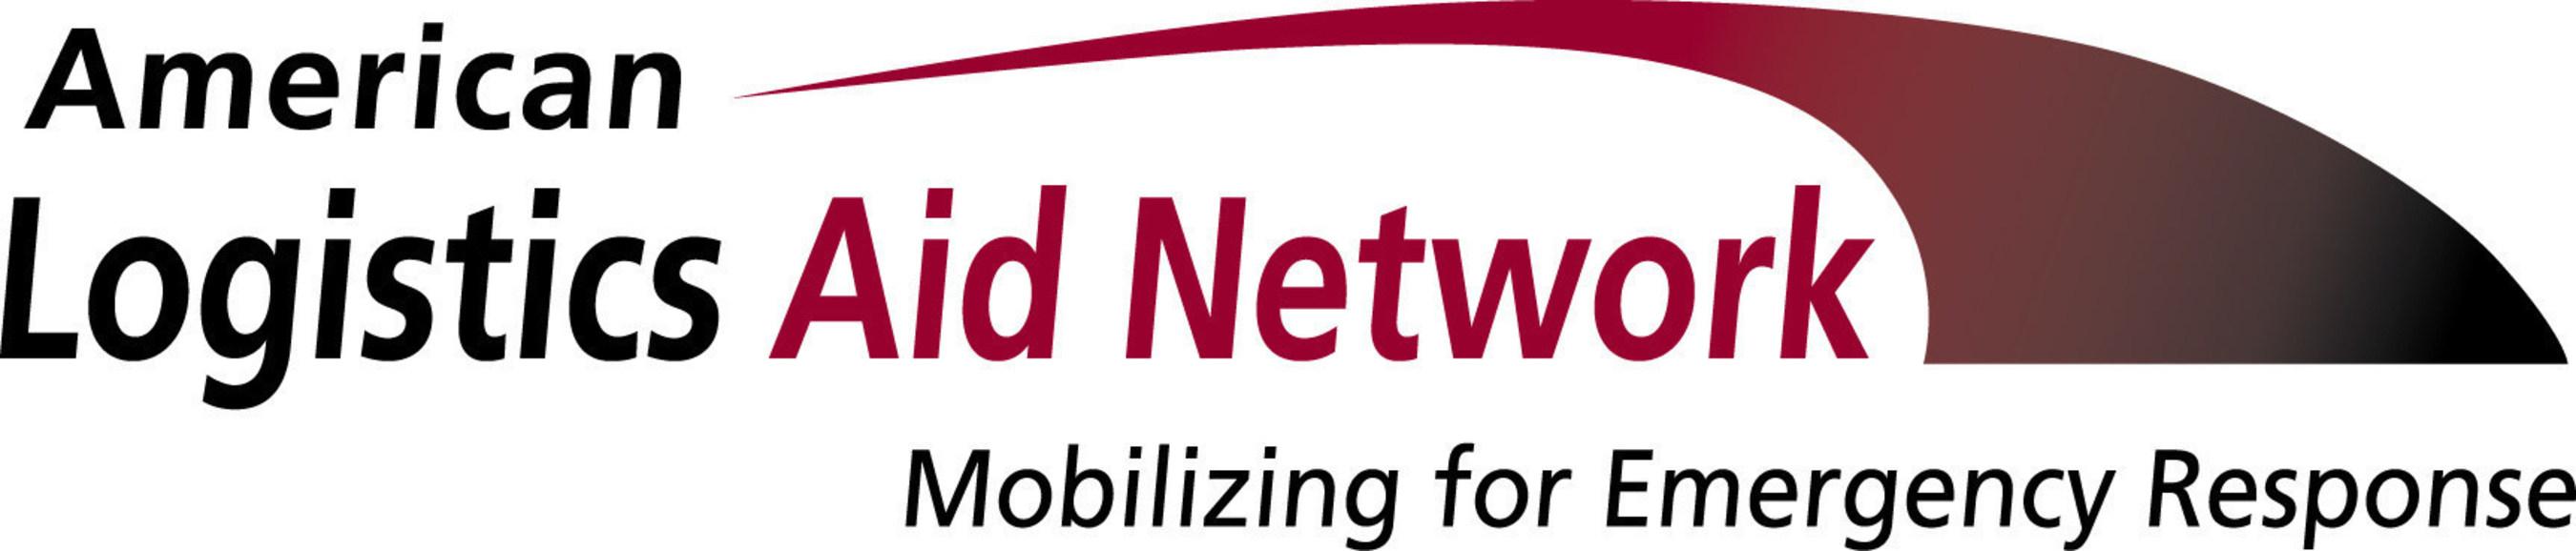 ALAN Announces Formal Partnership with Transportation Intermediaries Association